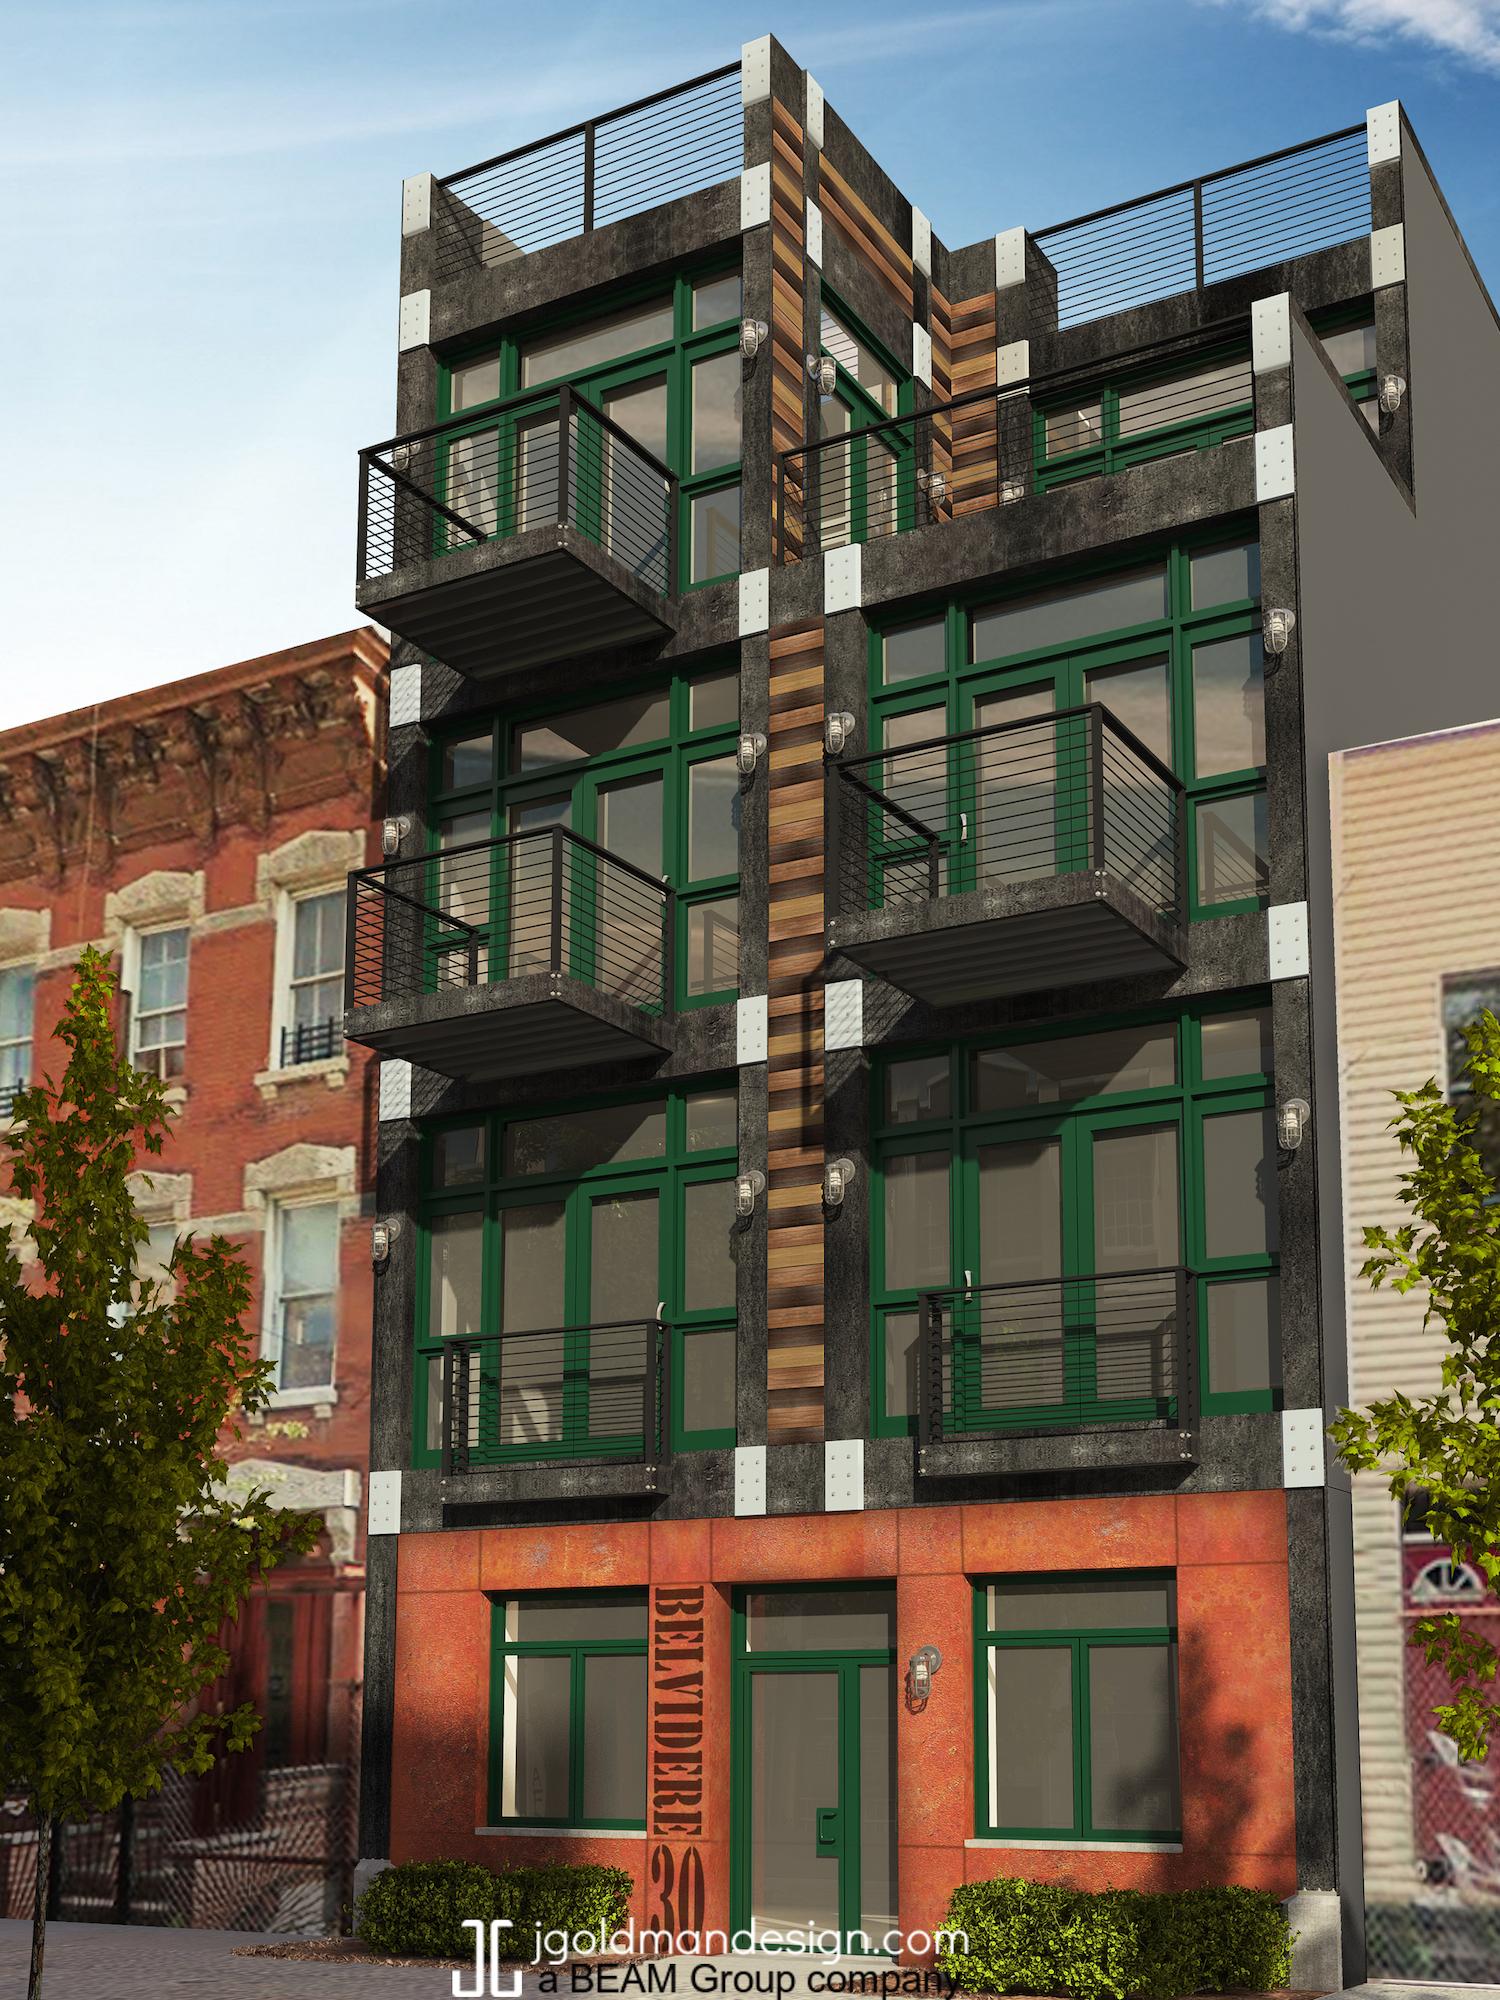 30 Belvedere Street, rendering by BEAM Group/ J Goodman Design